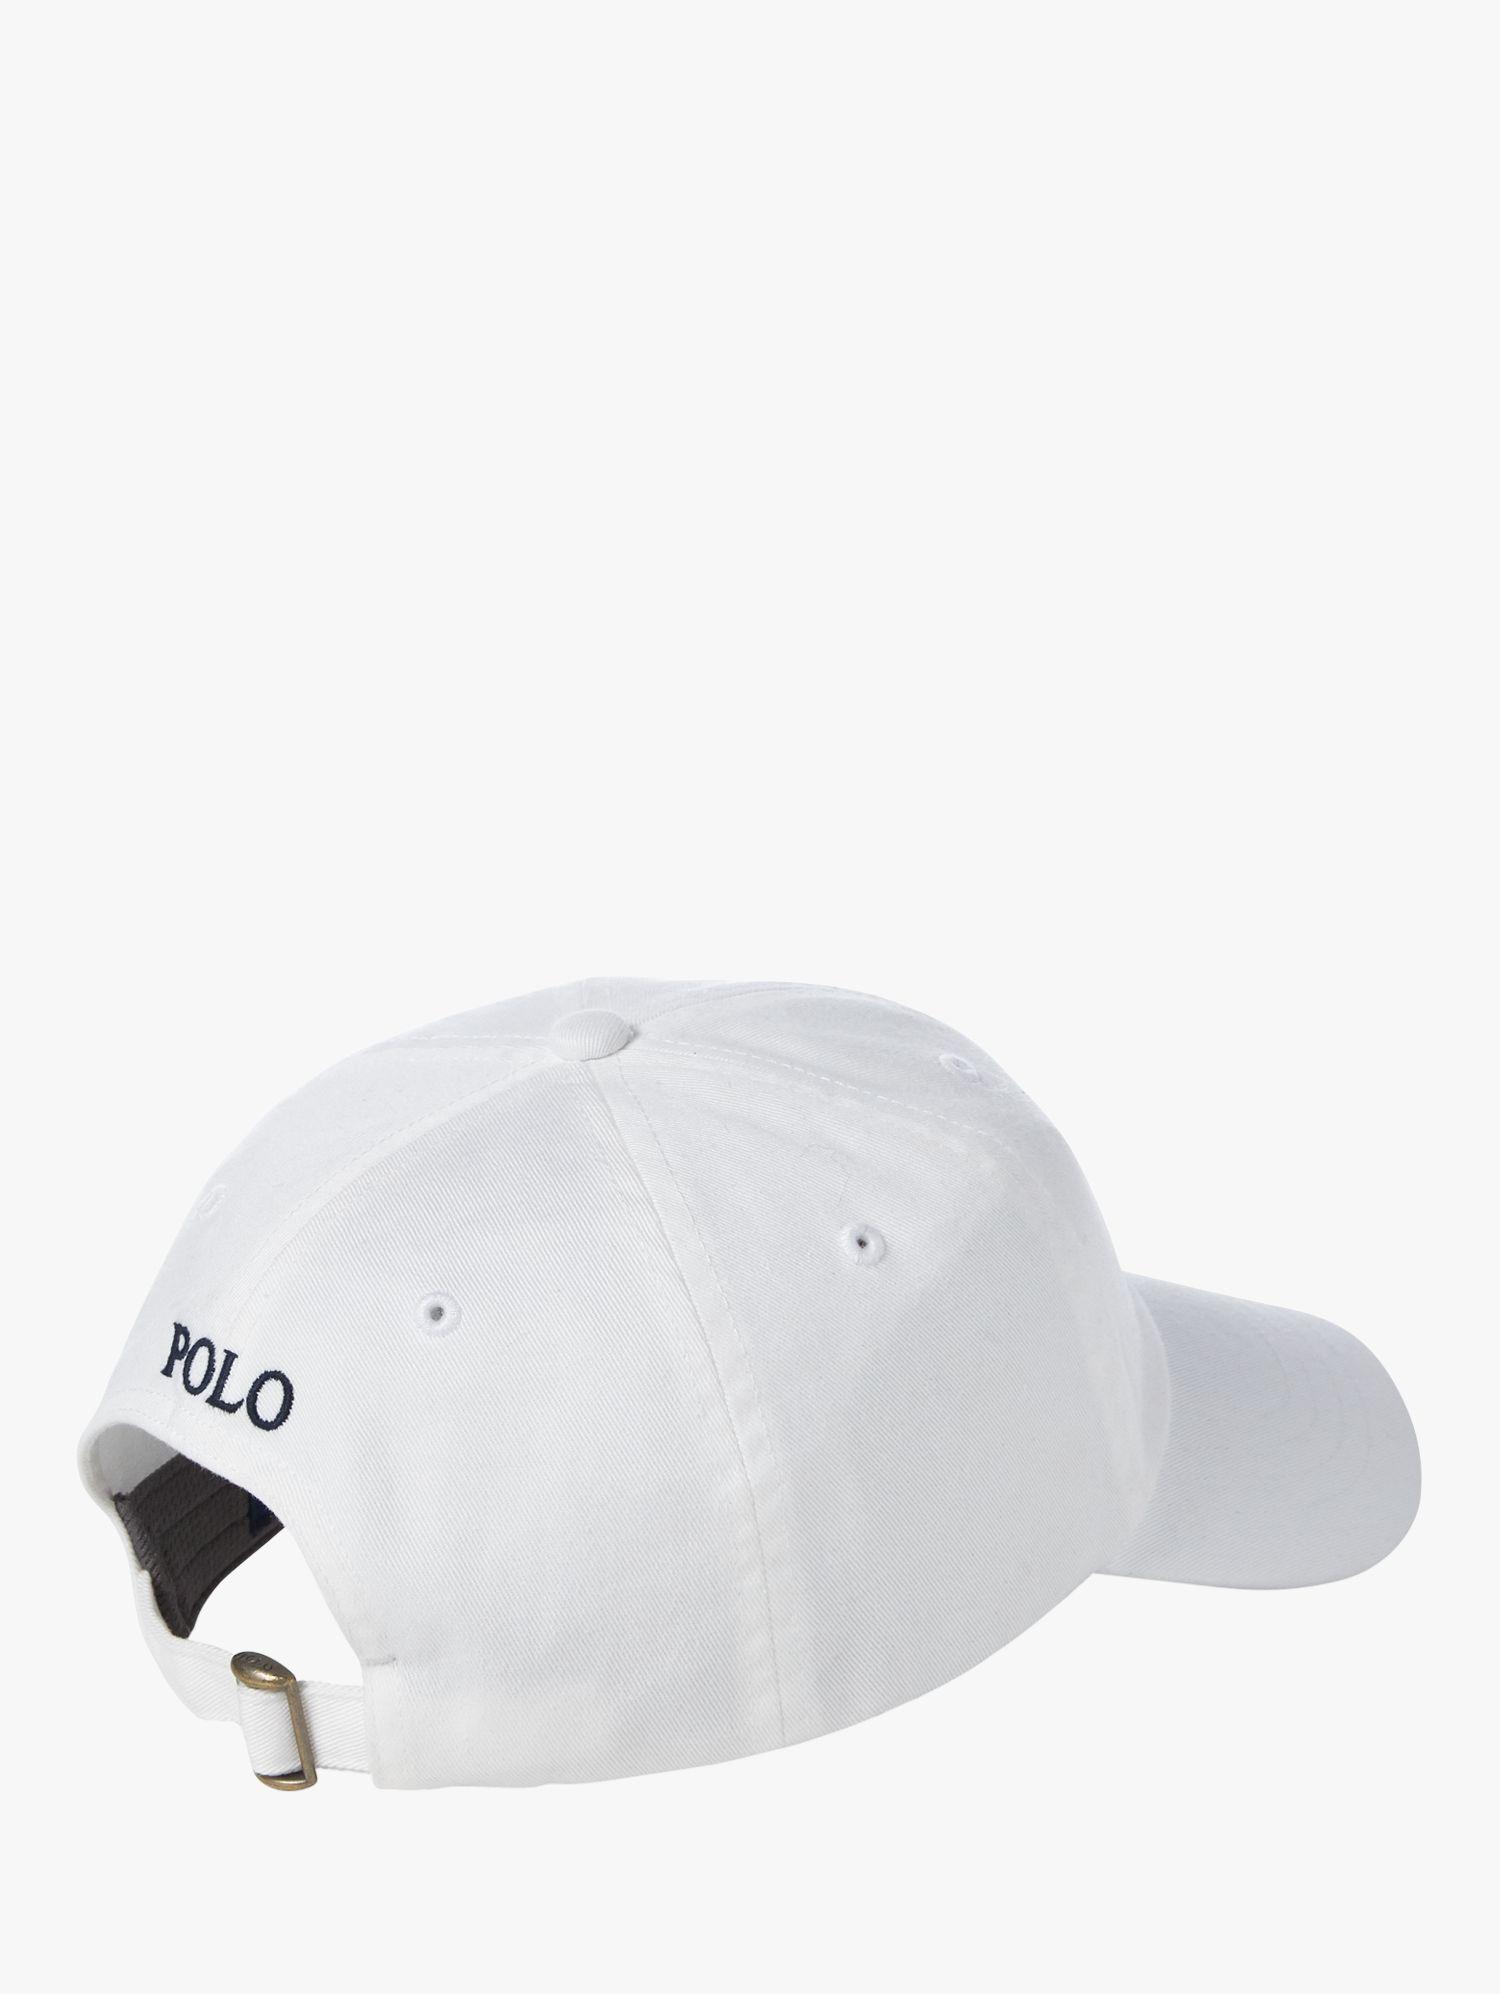 Ralph Lauren - White Polo Golf By Justin Thomas Bear Cap for Men - Lyst.  View fullscreen 30e7c8506fb3